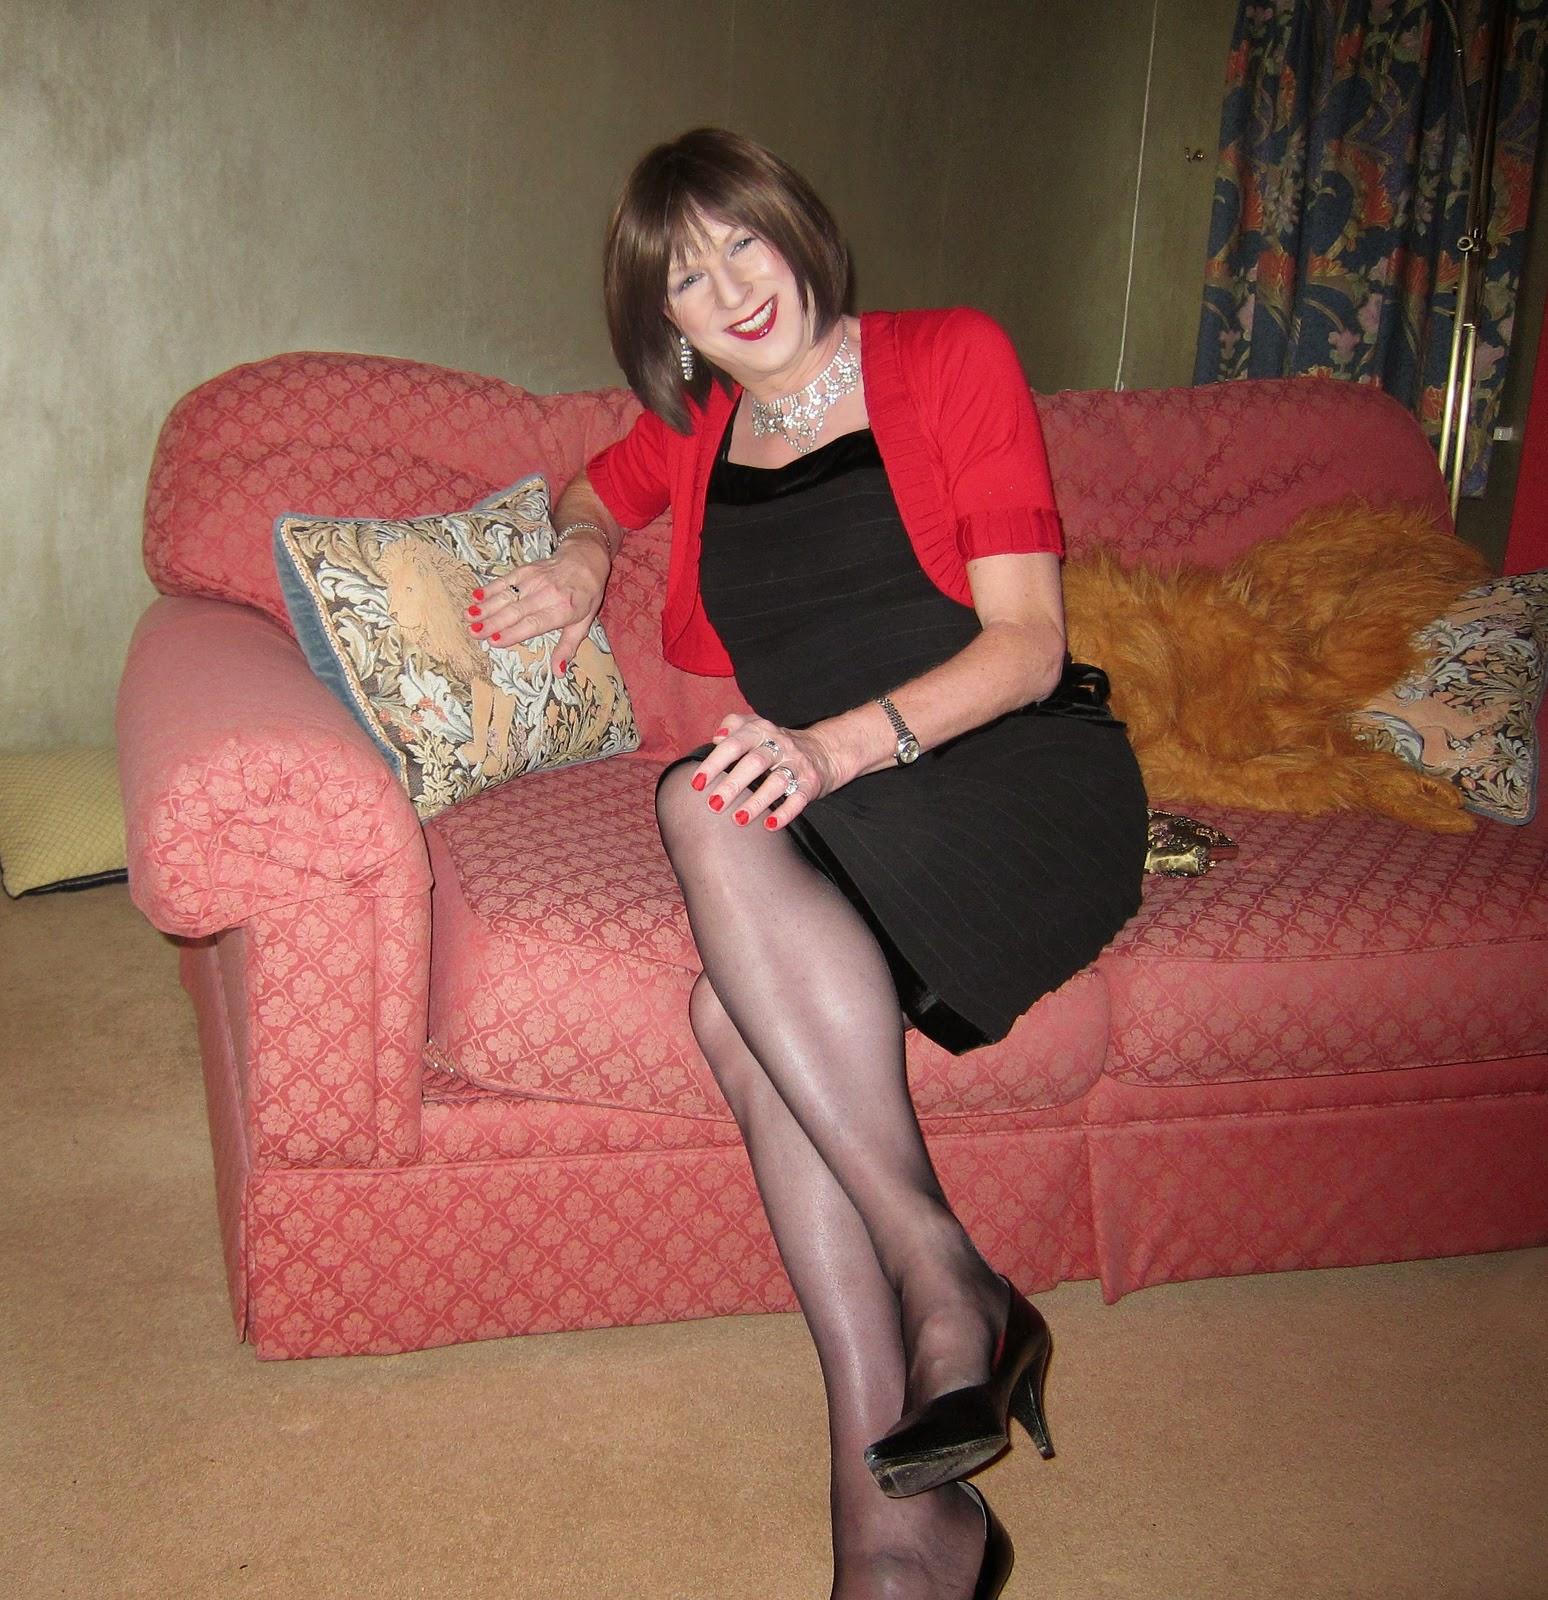 Tgirls on Flickr: Sarah Bell on the Sofa